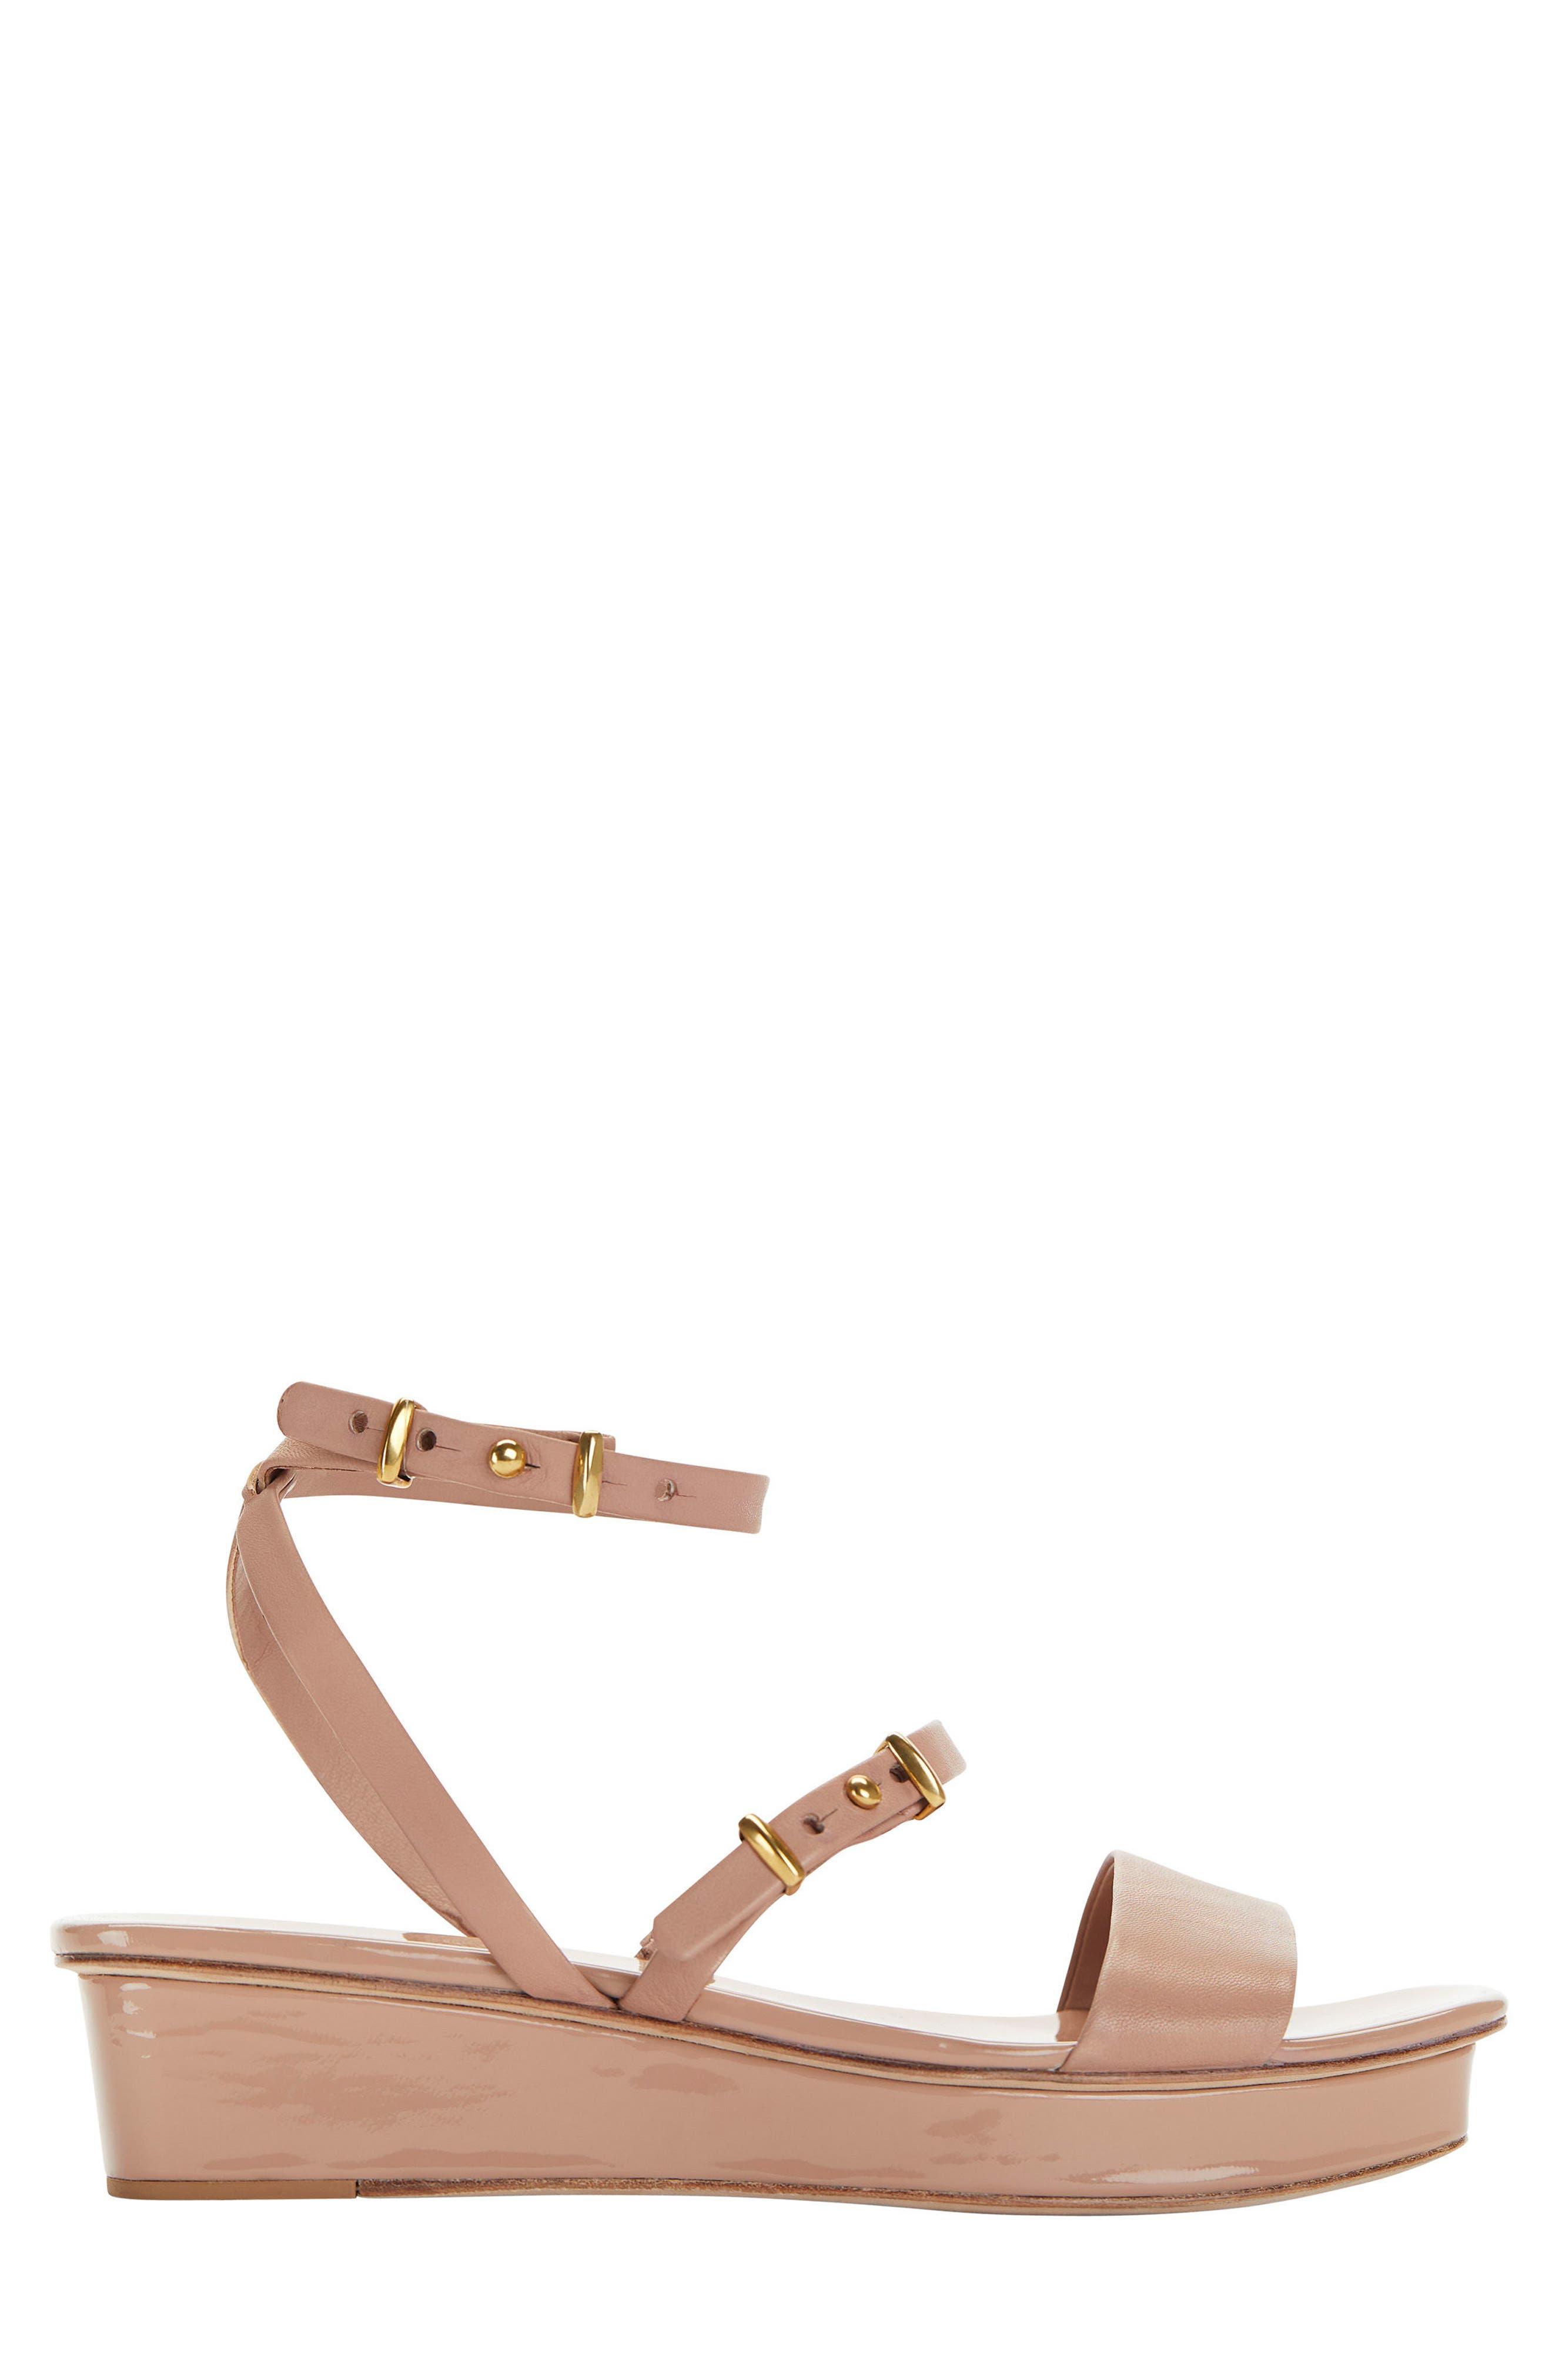 Ankle Strap Wedge Sandal,                             Alternate thumbnail 6, color,